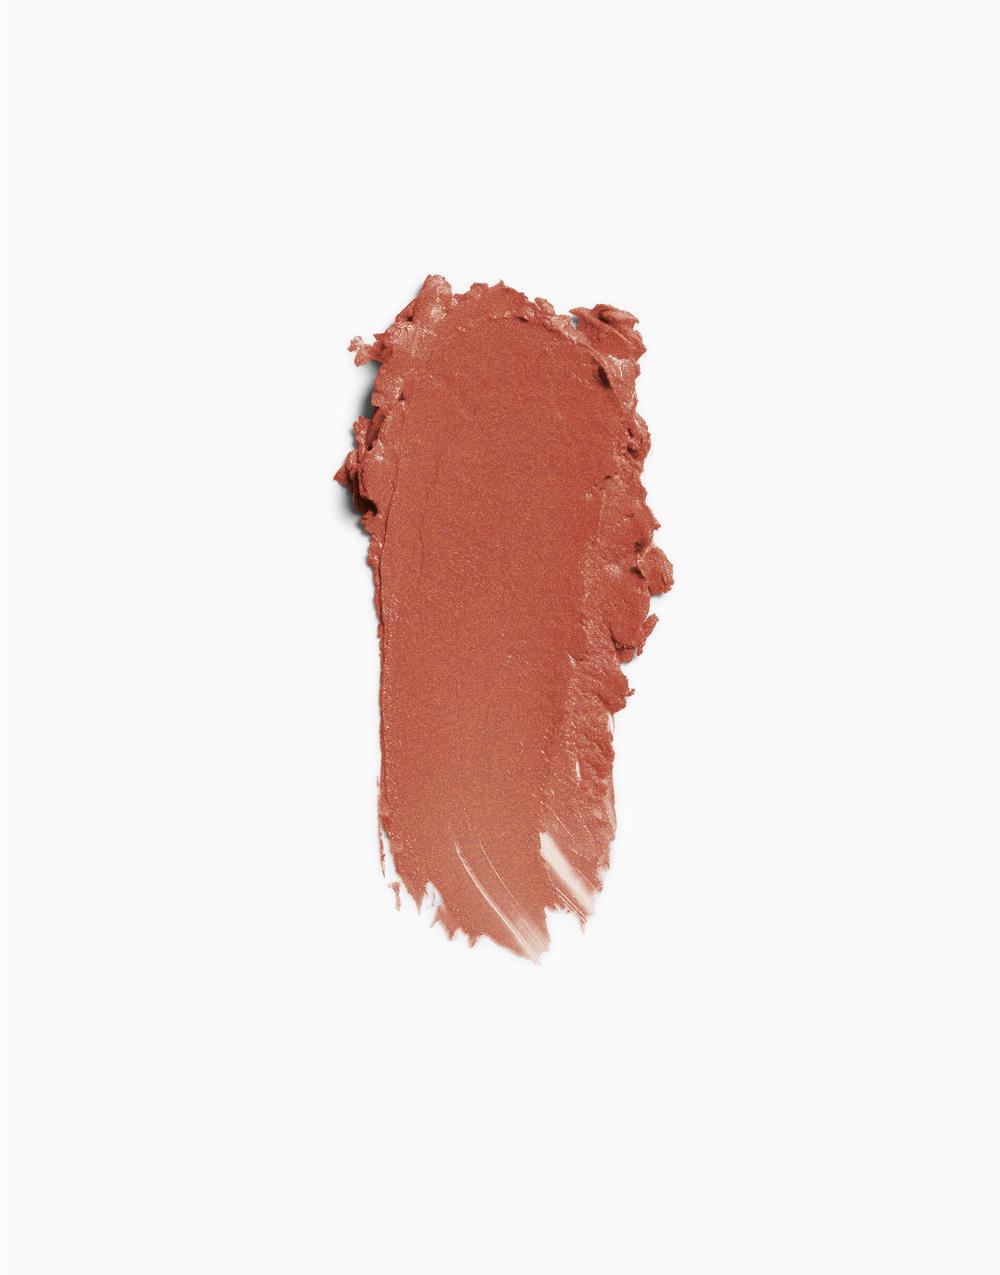 Exhibitionist Cream Lipstick by CoverGirl   Coffee Crave